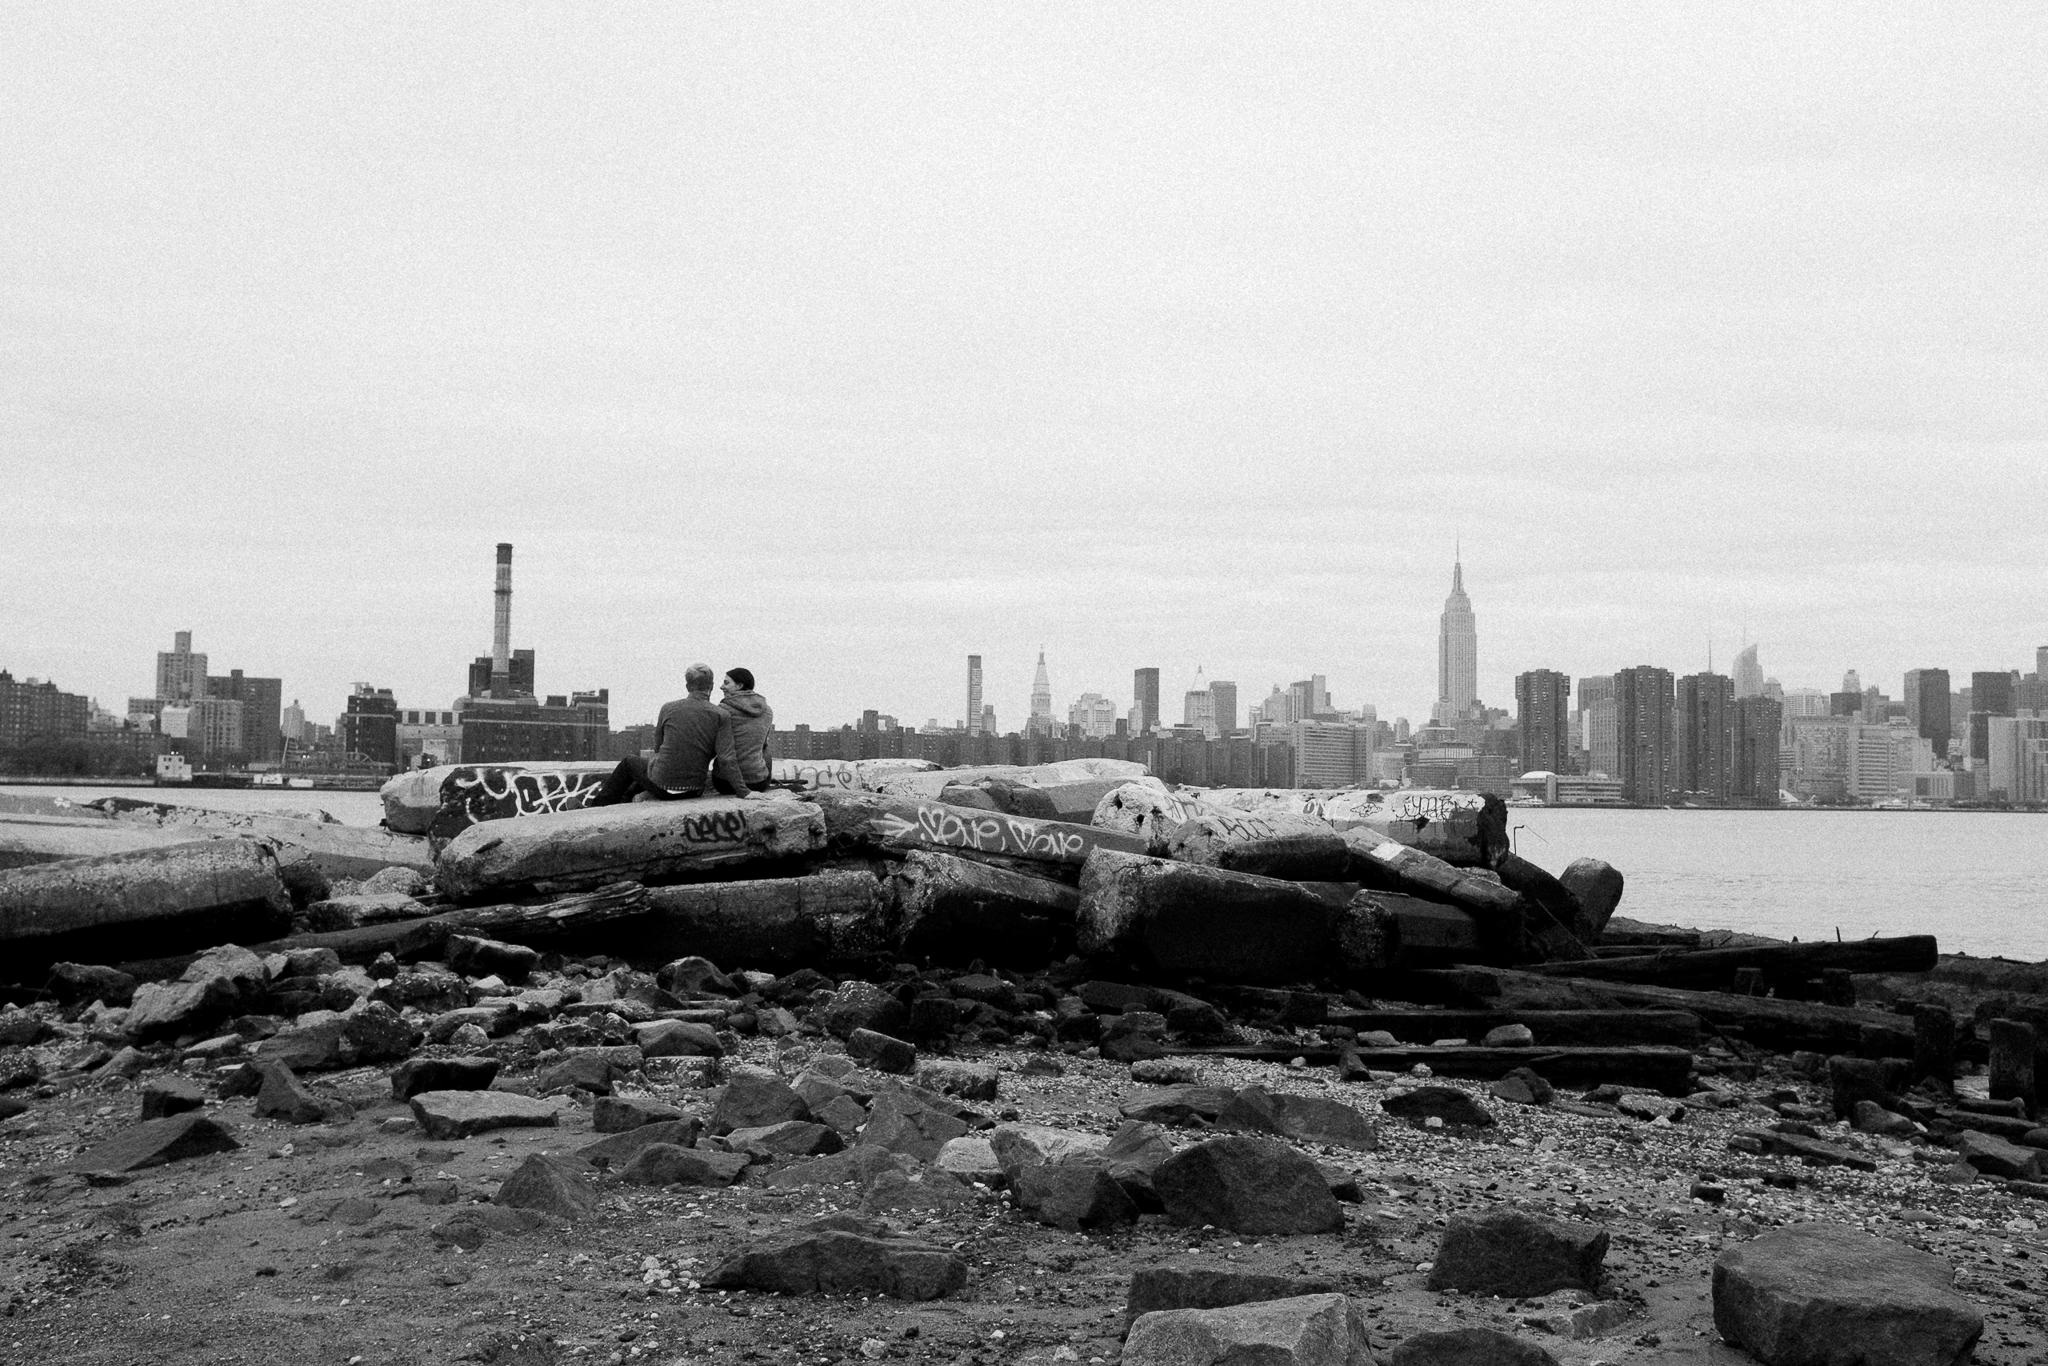 2015-05-14-NYC-1354.jpg